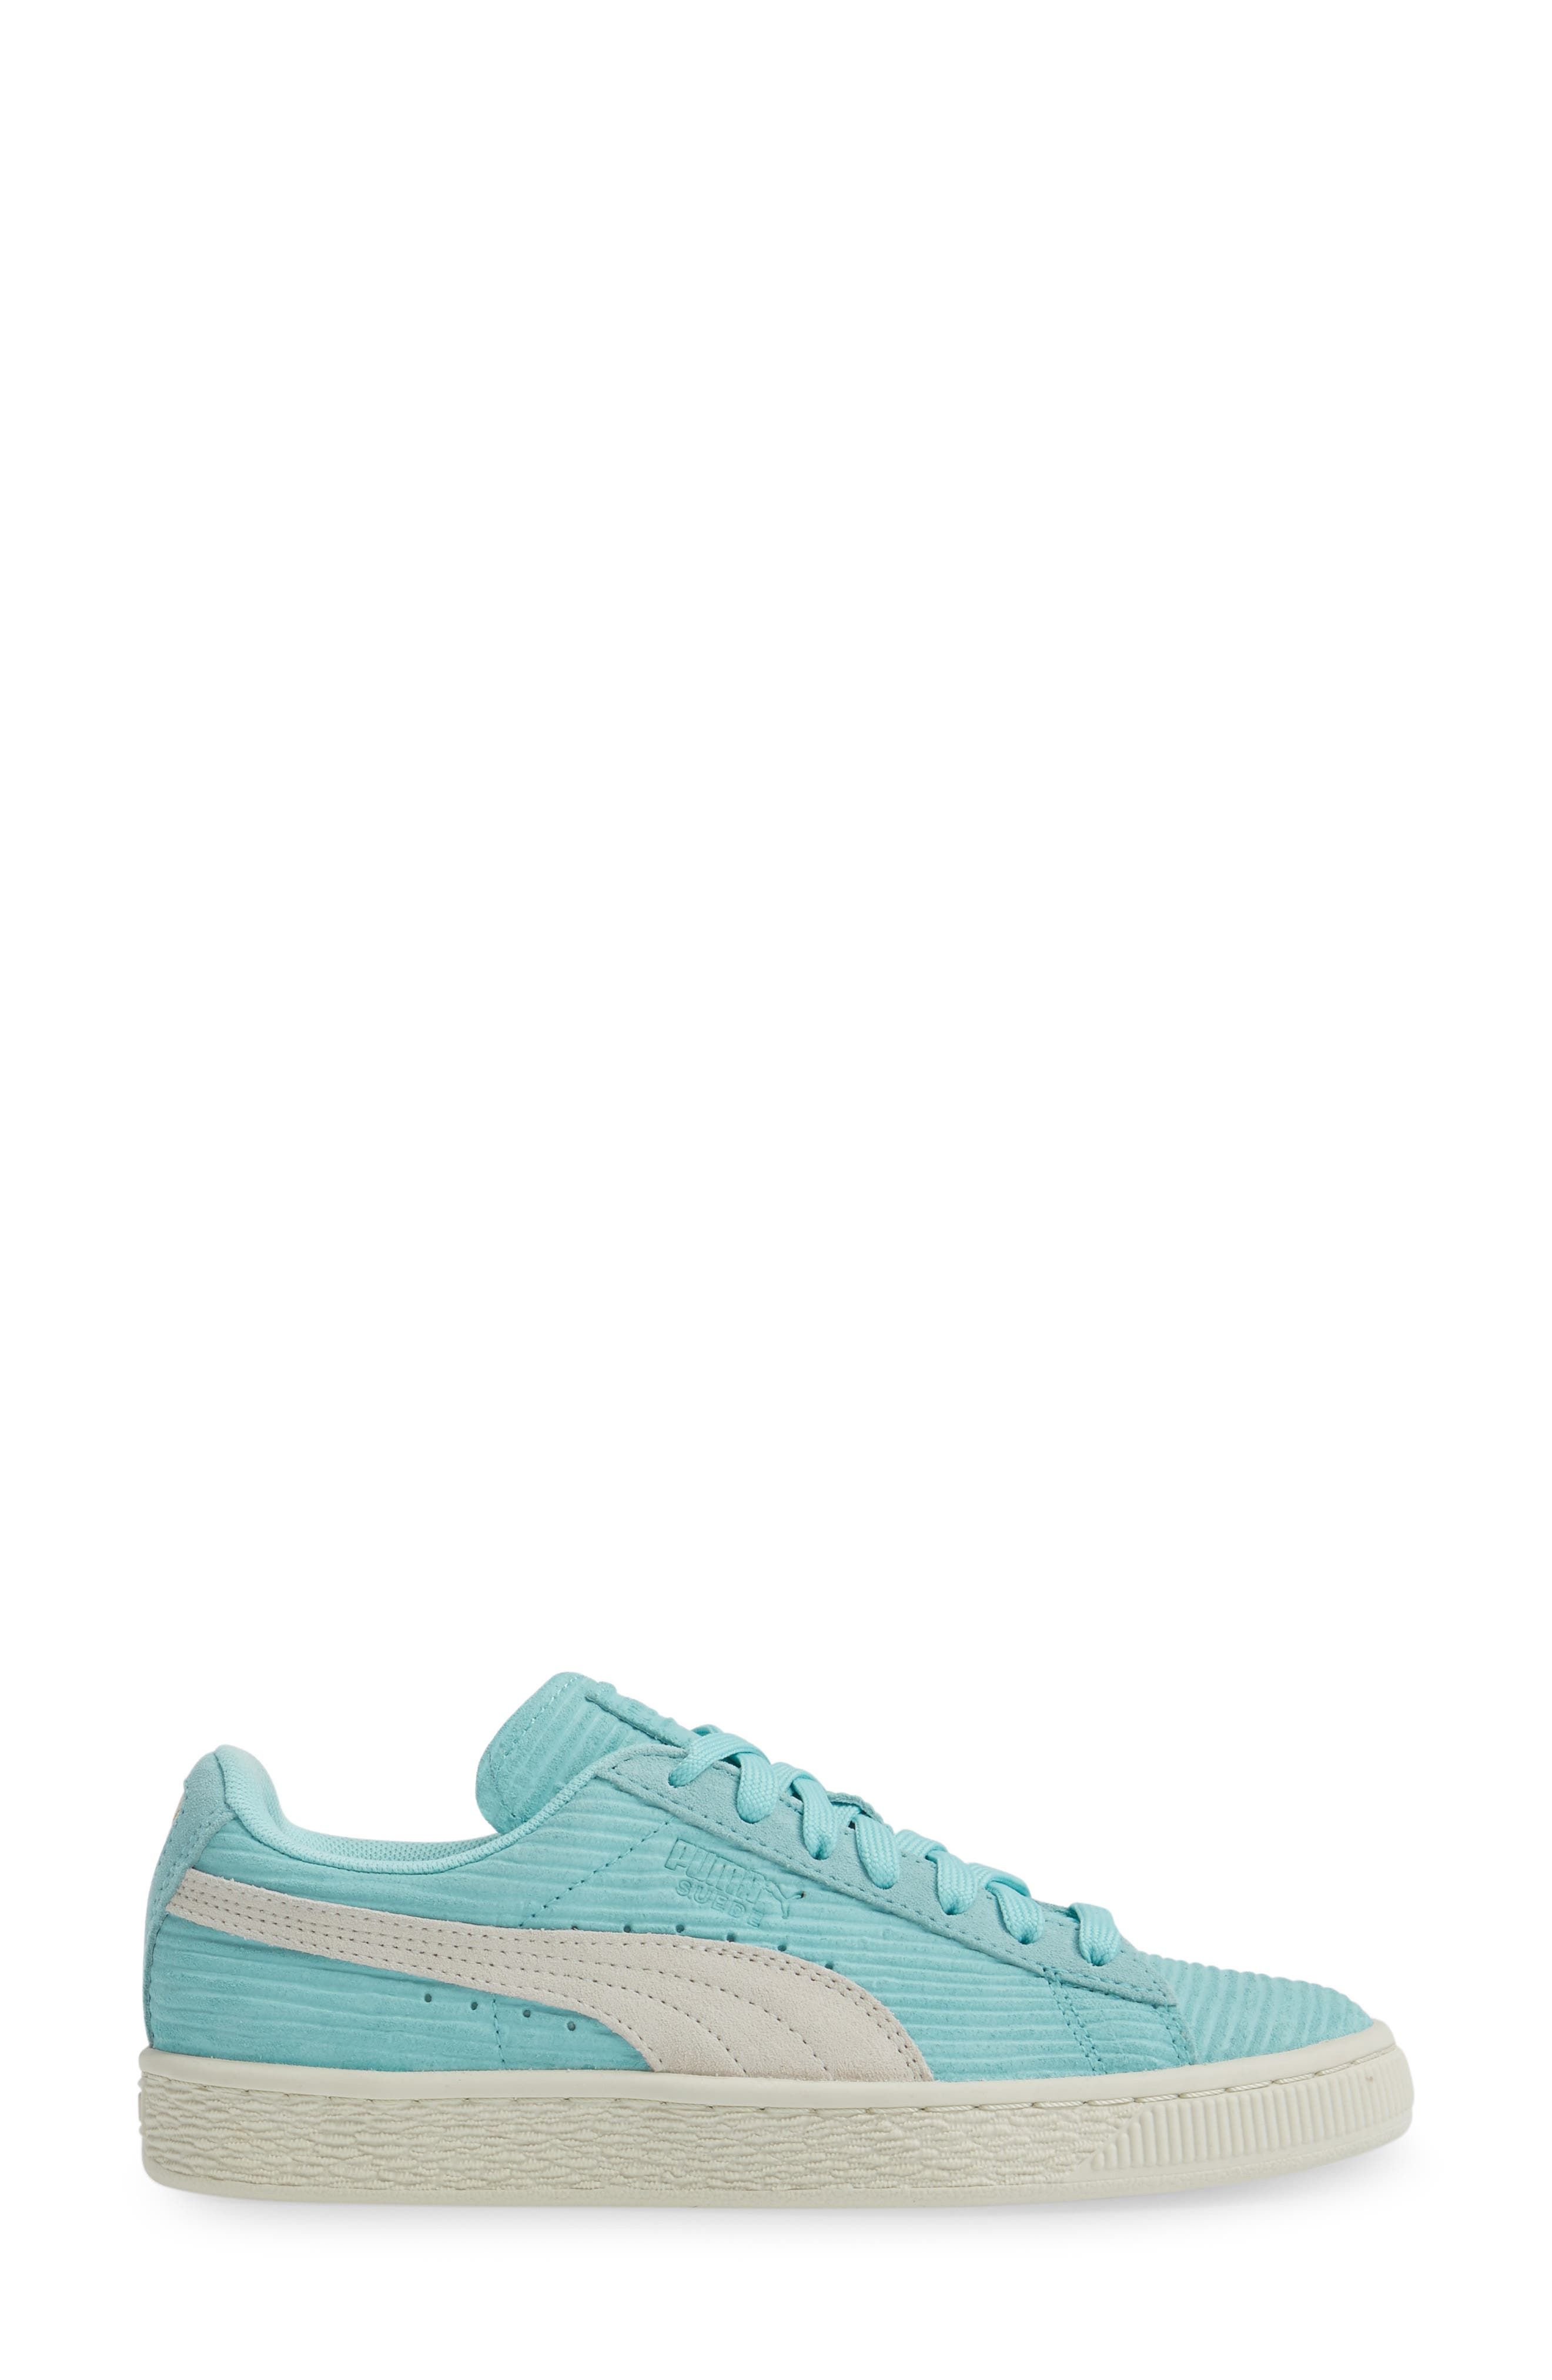 Alternate Image 3  - PUMA Suede Classic Embossed Sneaker (Women)